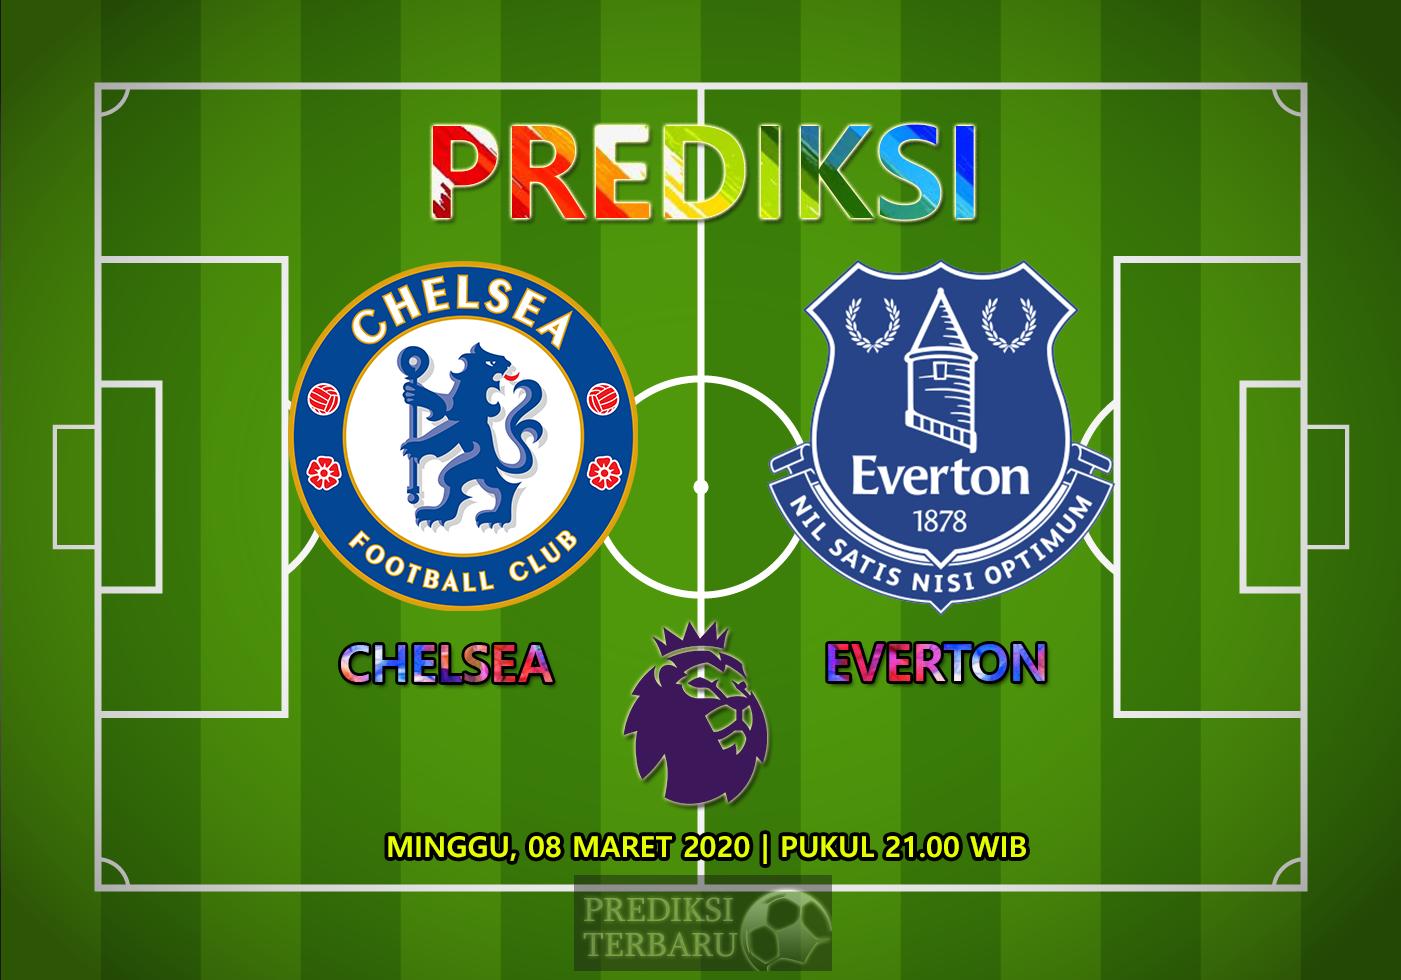 Prediksi Chelsea Vs Everton Minggu 08 Maret